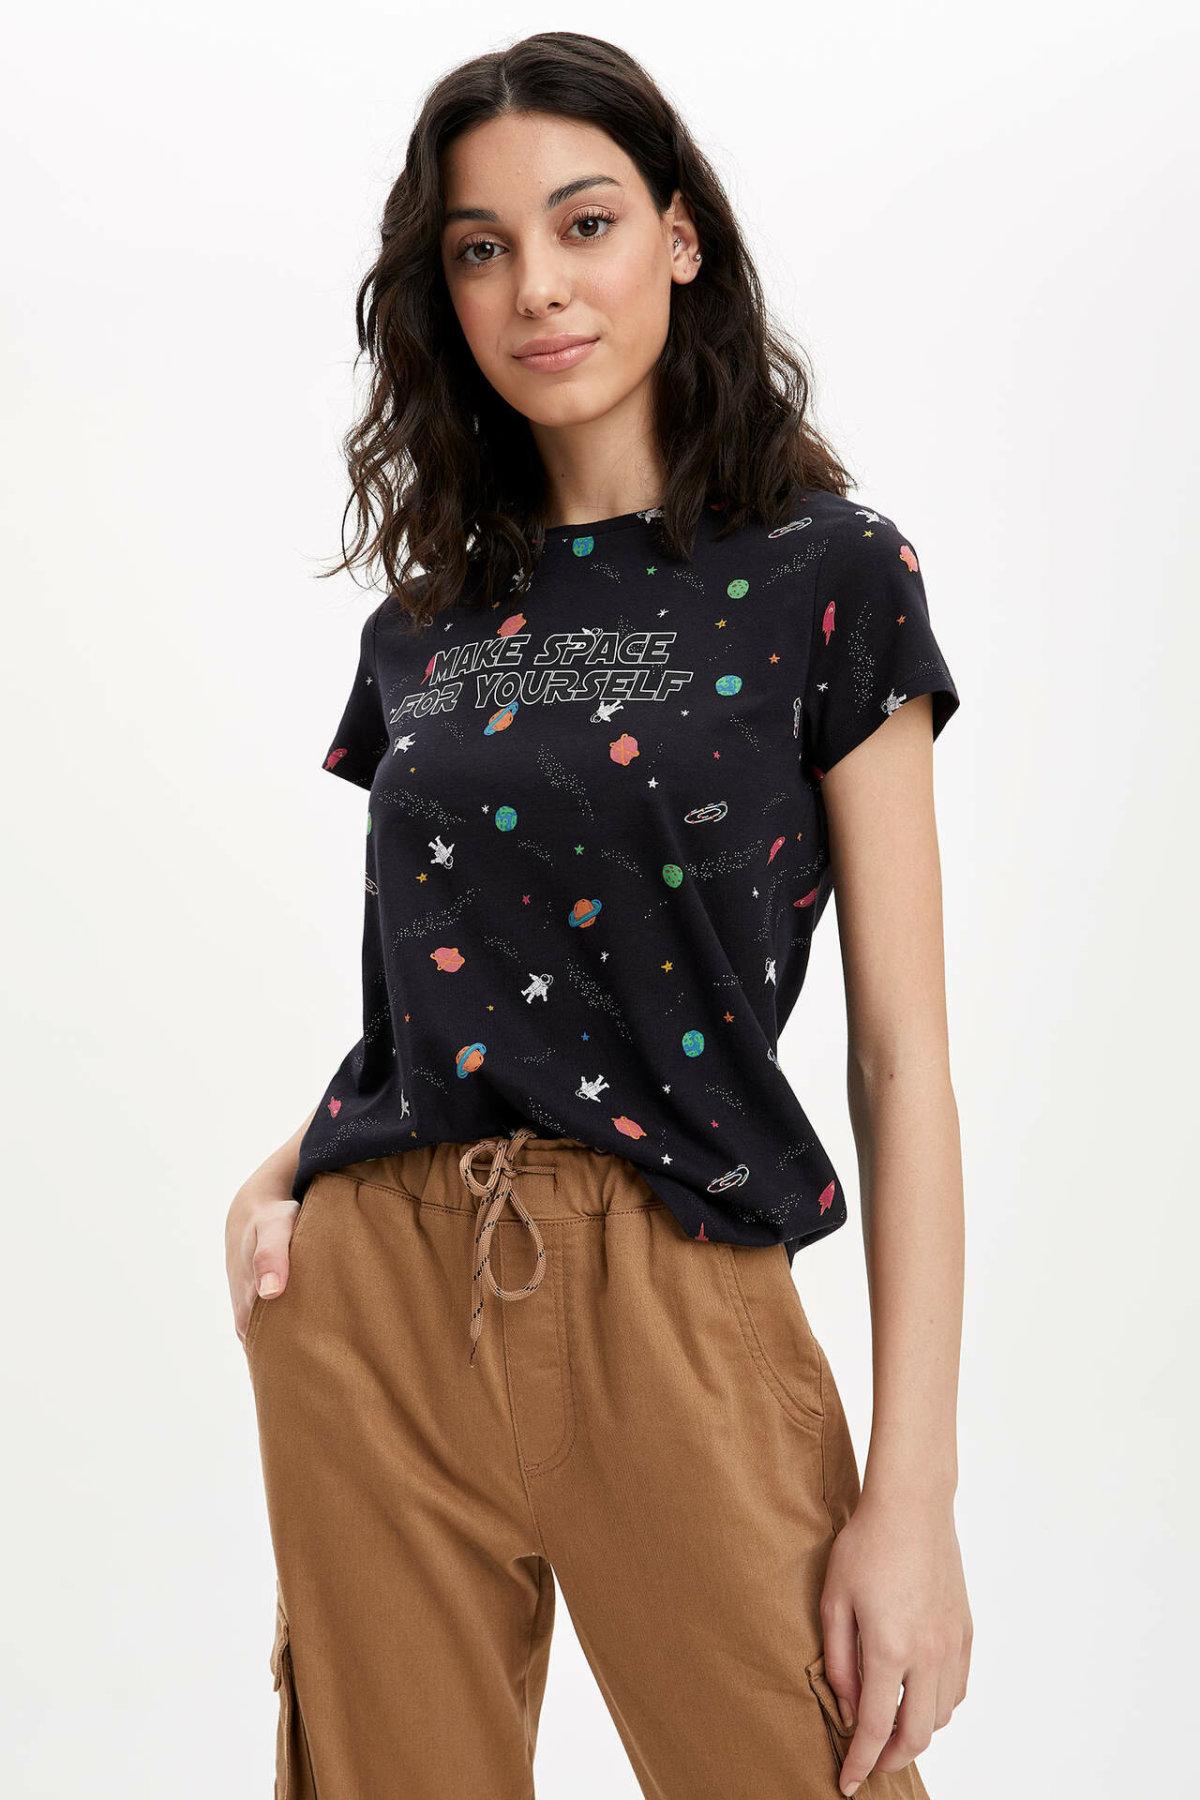 DeFacto Woman Short Sleeve T-Shirt Women's Spring Cute Printed Top Tees Women's Casual Black Tshirts Tops-R2441AZ20SP